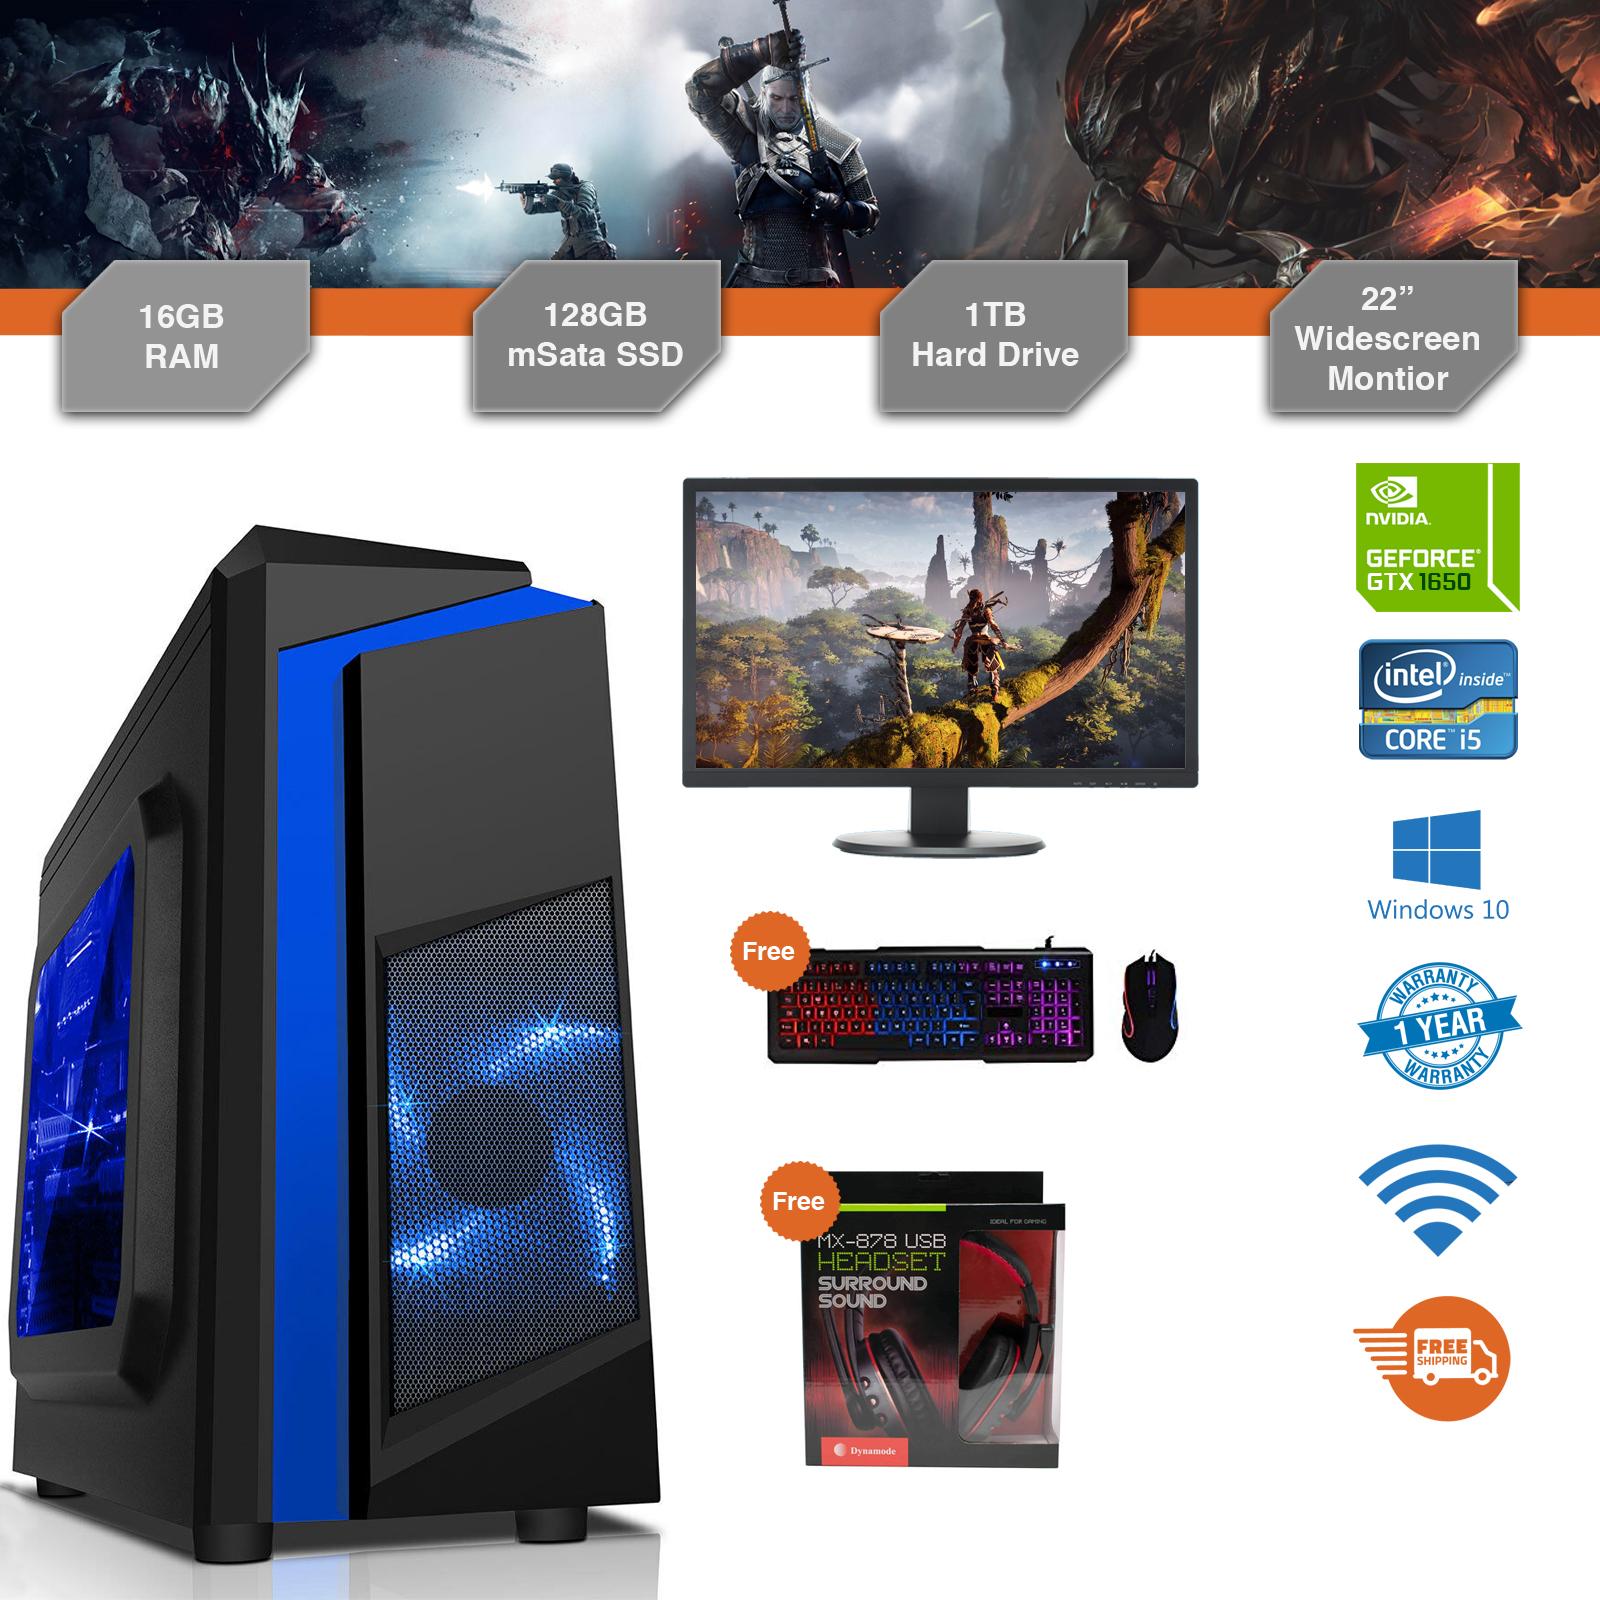 Gaming PC Bundle Intel Core i5 3.1GHz Win10 GTX1650 16GB RAM 128GB SSD 1TB Cheap